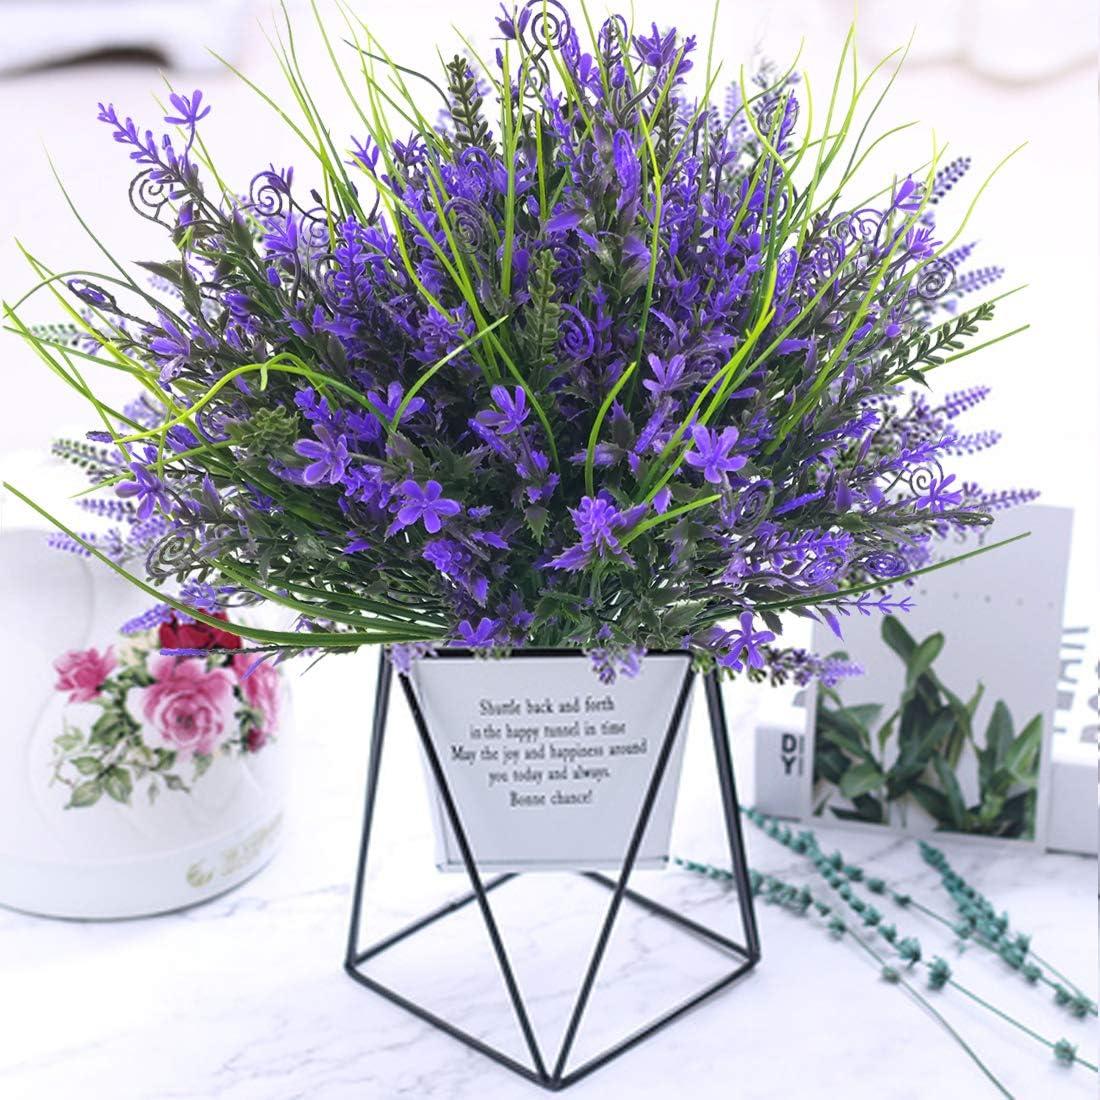 Amazon Promo Code for 6 Bundles Artificial Flowers Outdoor UV Resistant